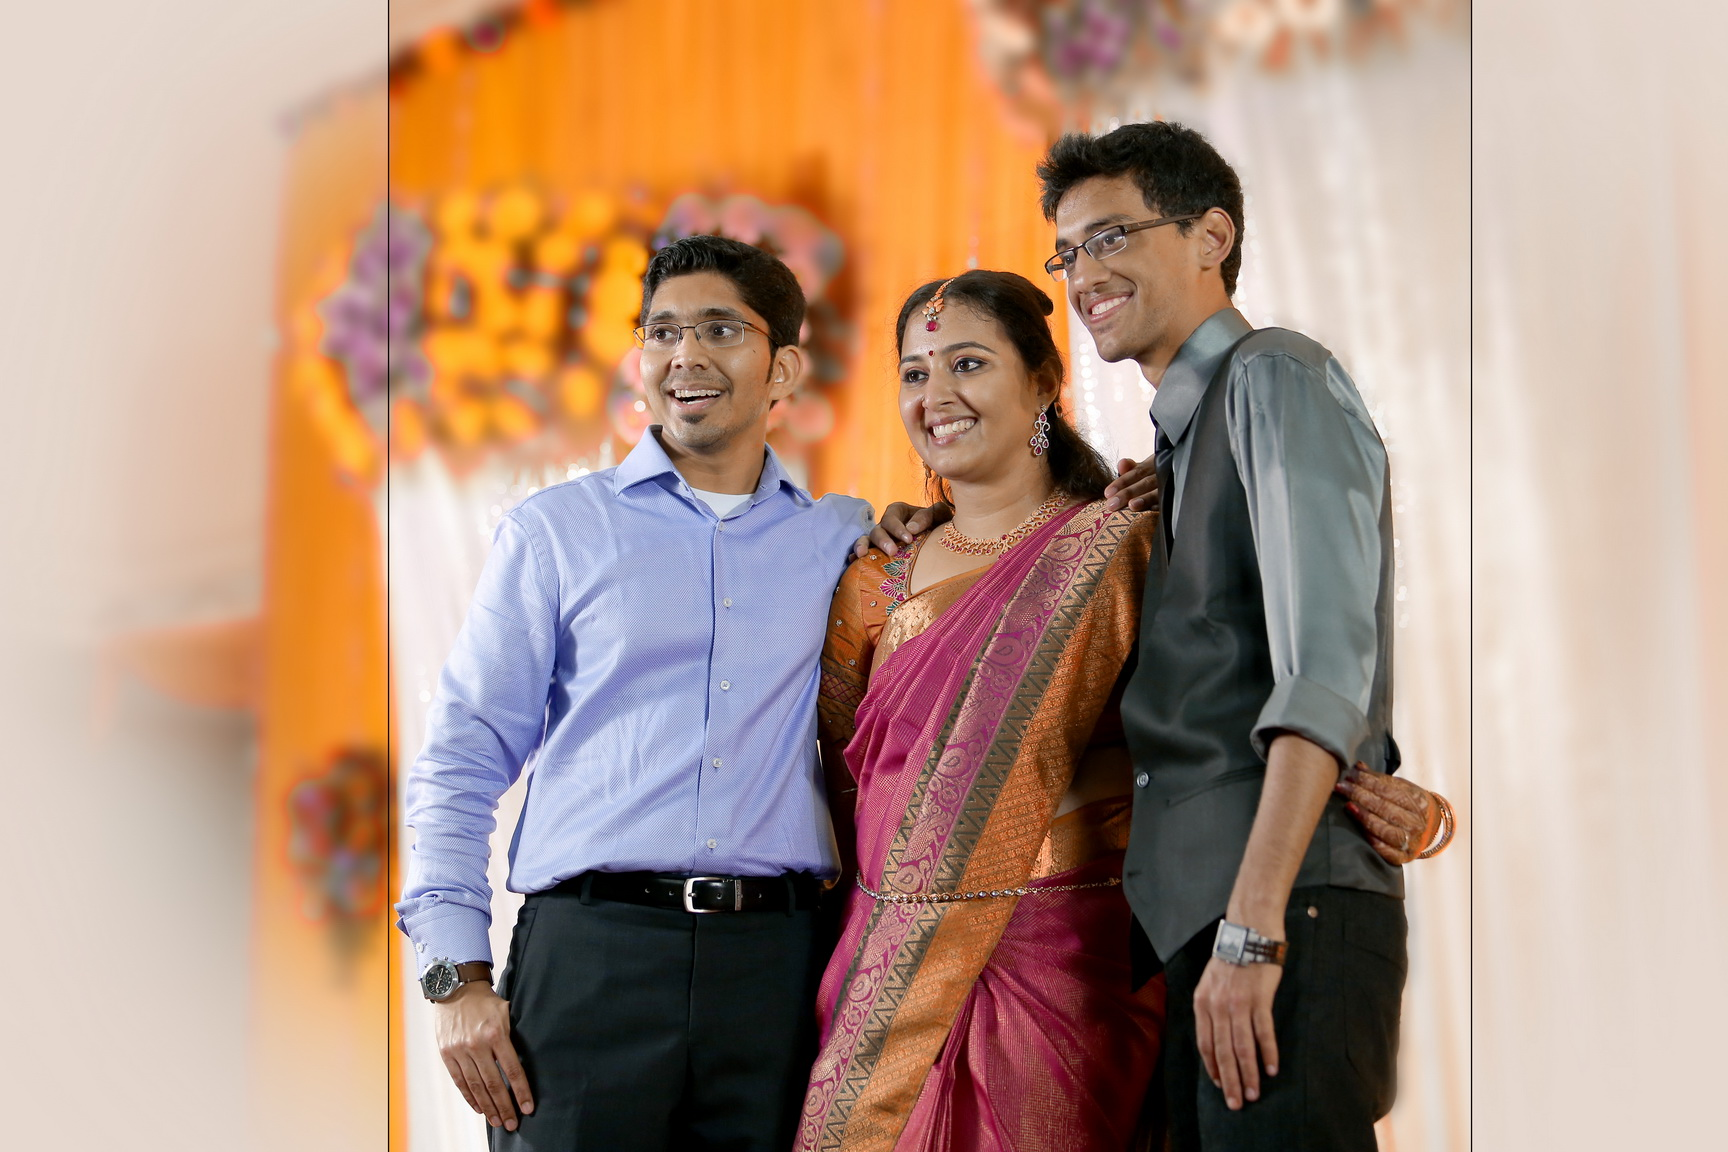 candid photographers india